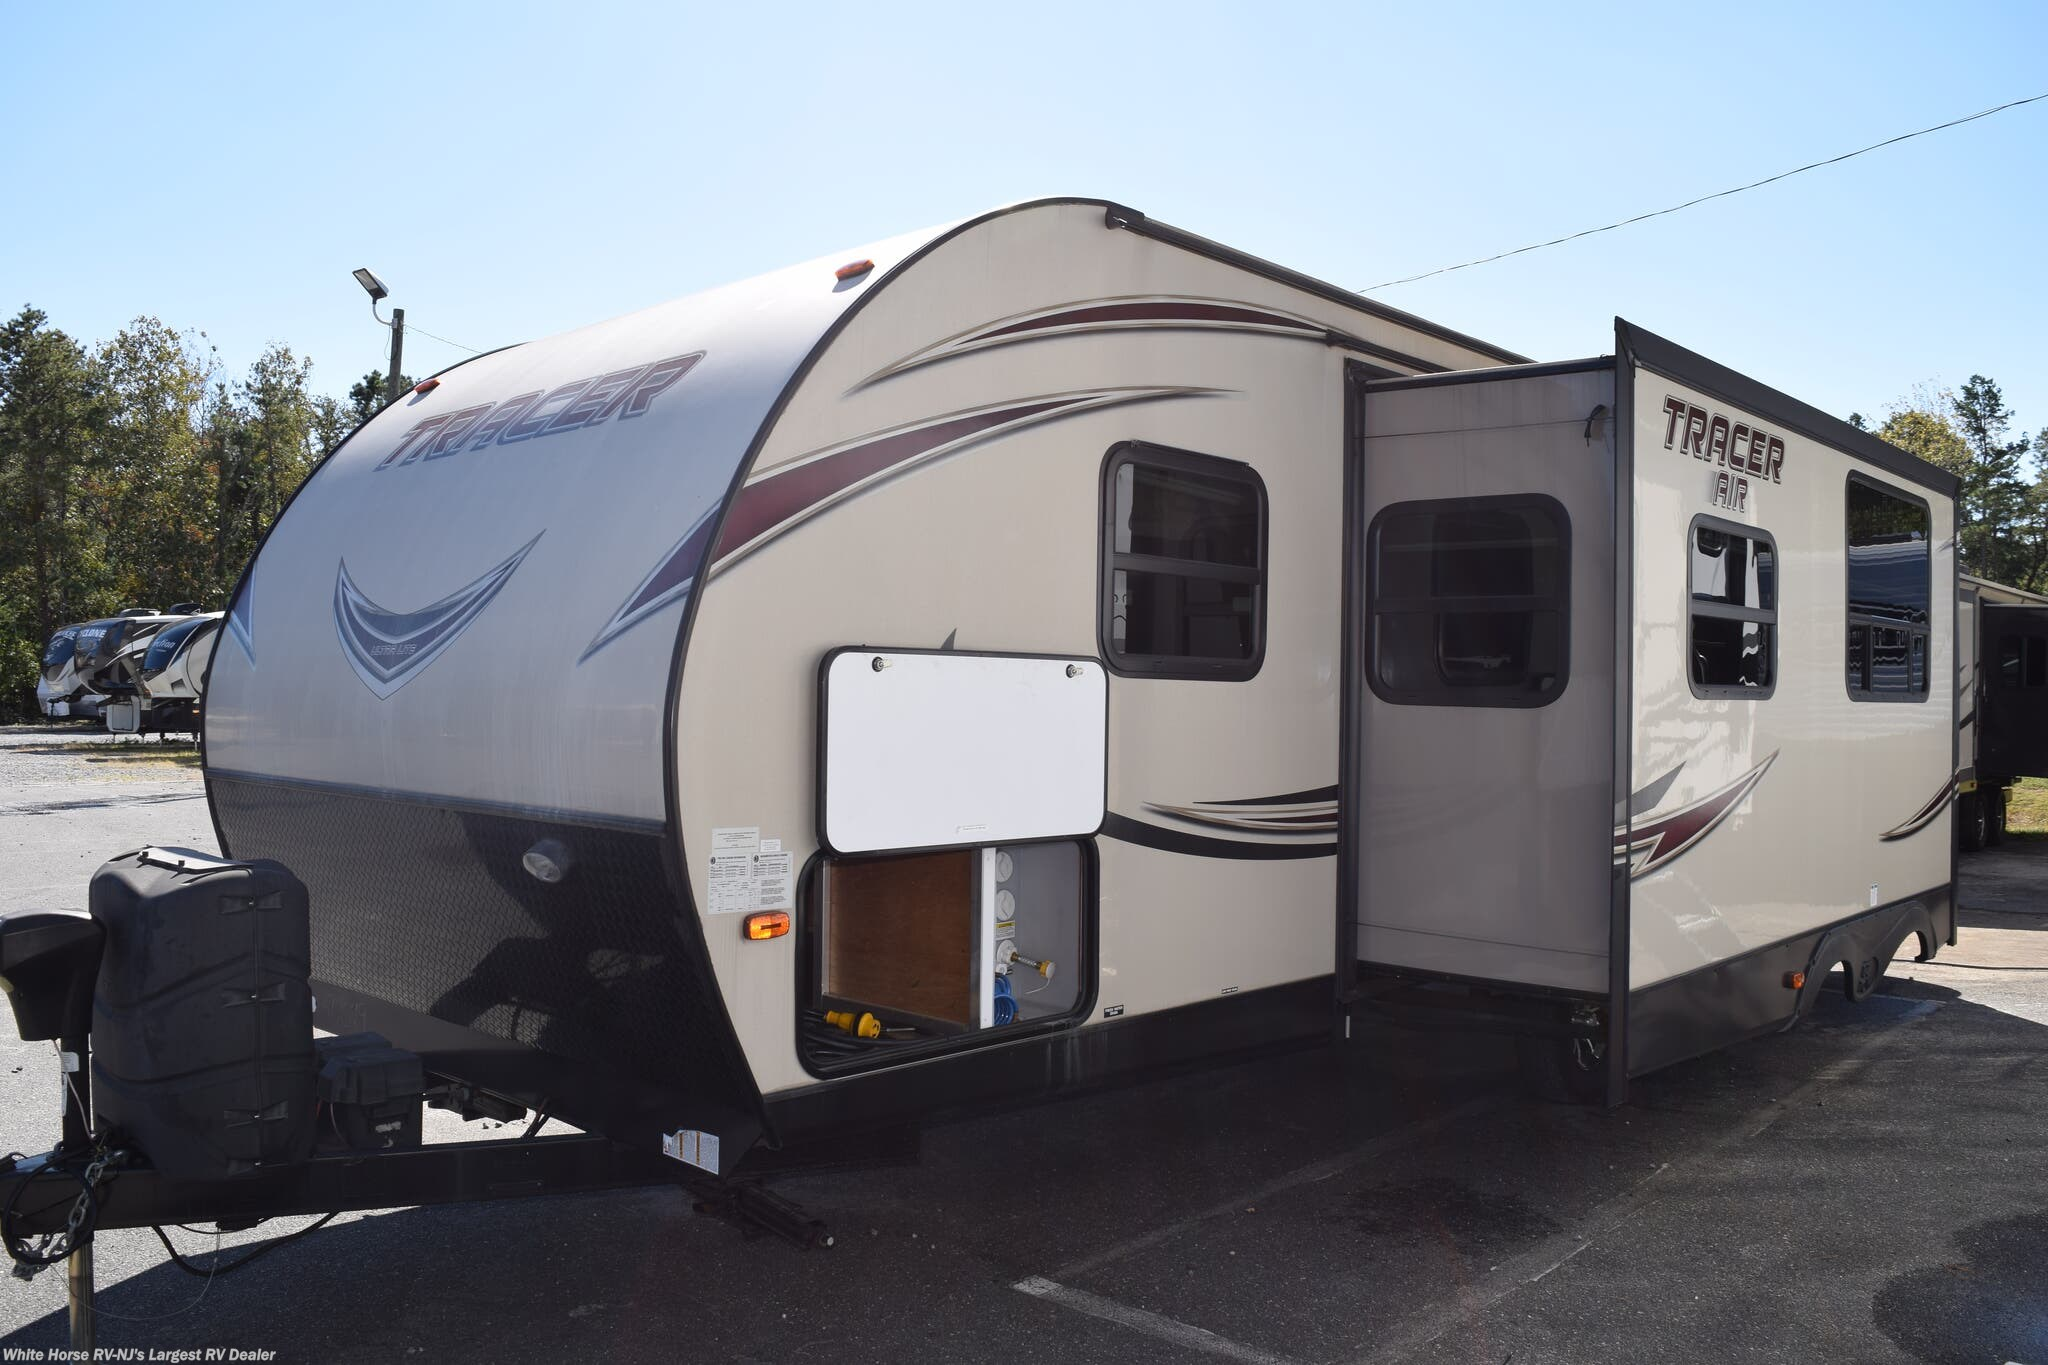 Used Tracer Travel trailers for sale - TrailersMarket.com